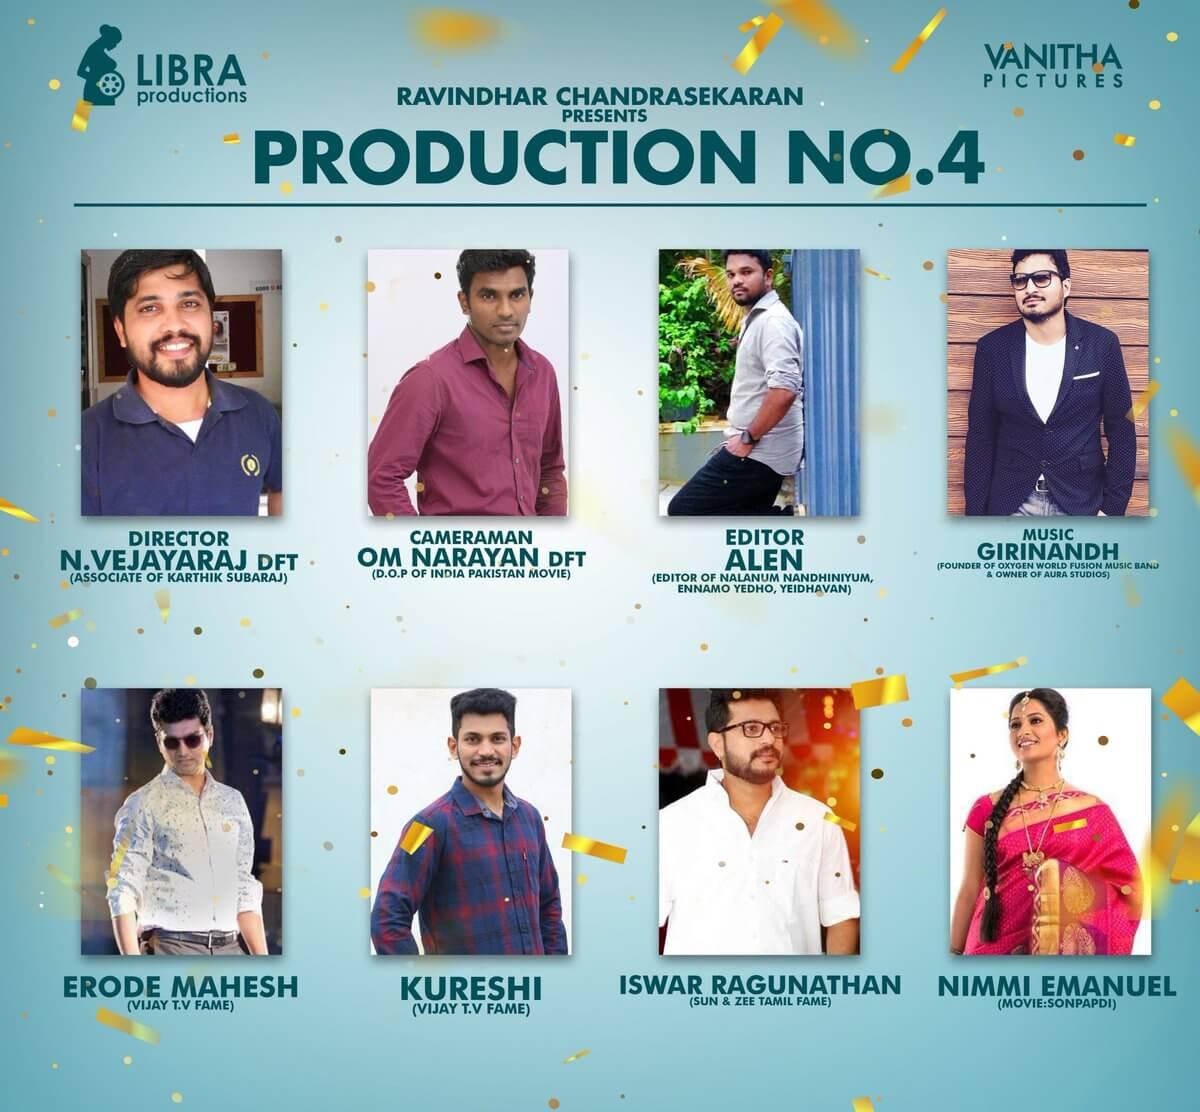 libra productions new movie